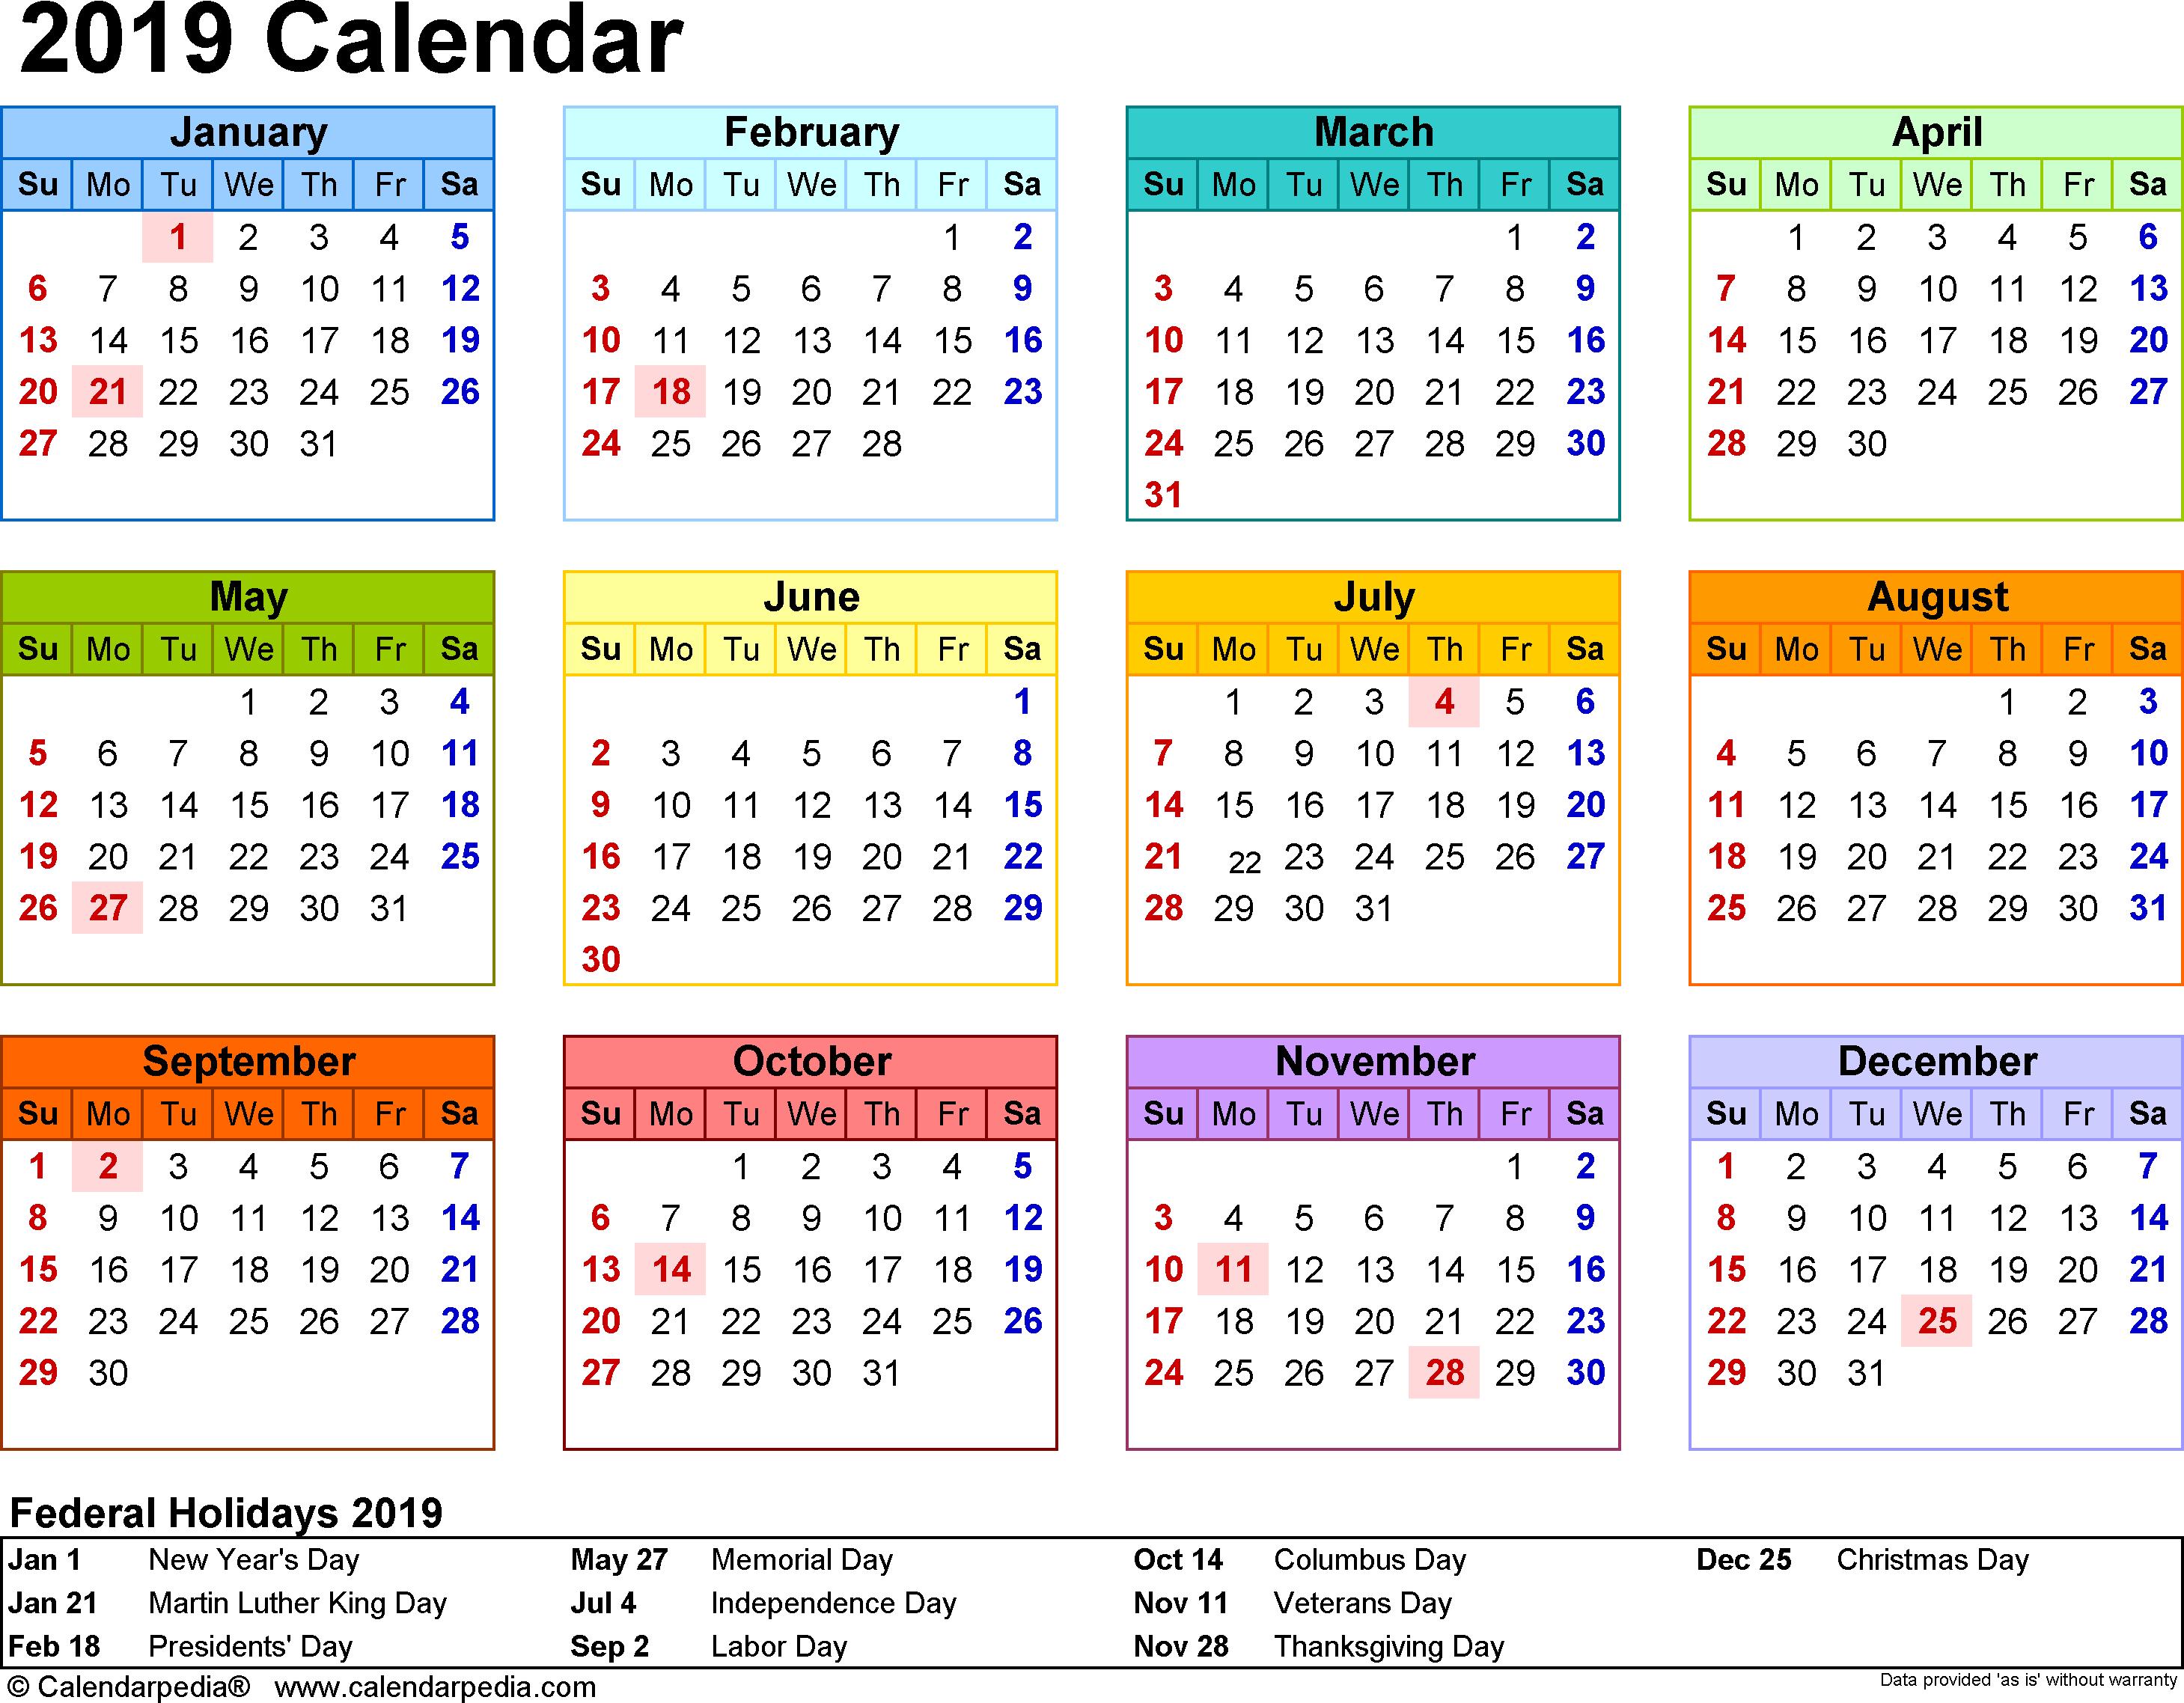 7 Best Uk Holidays 2019 | Bank, School, Public Holidays 2019 With Uri Academic Calendar Holiday